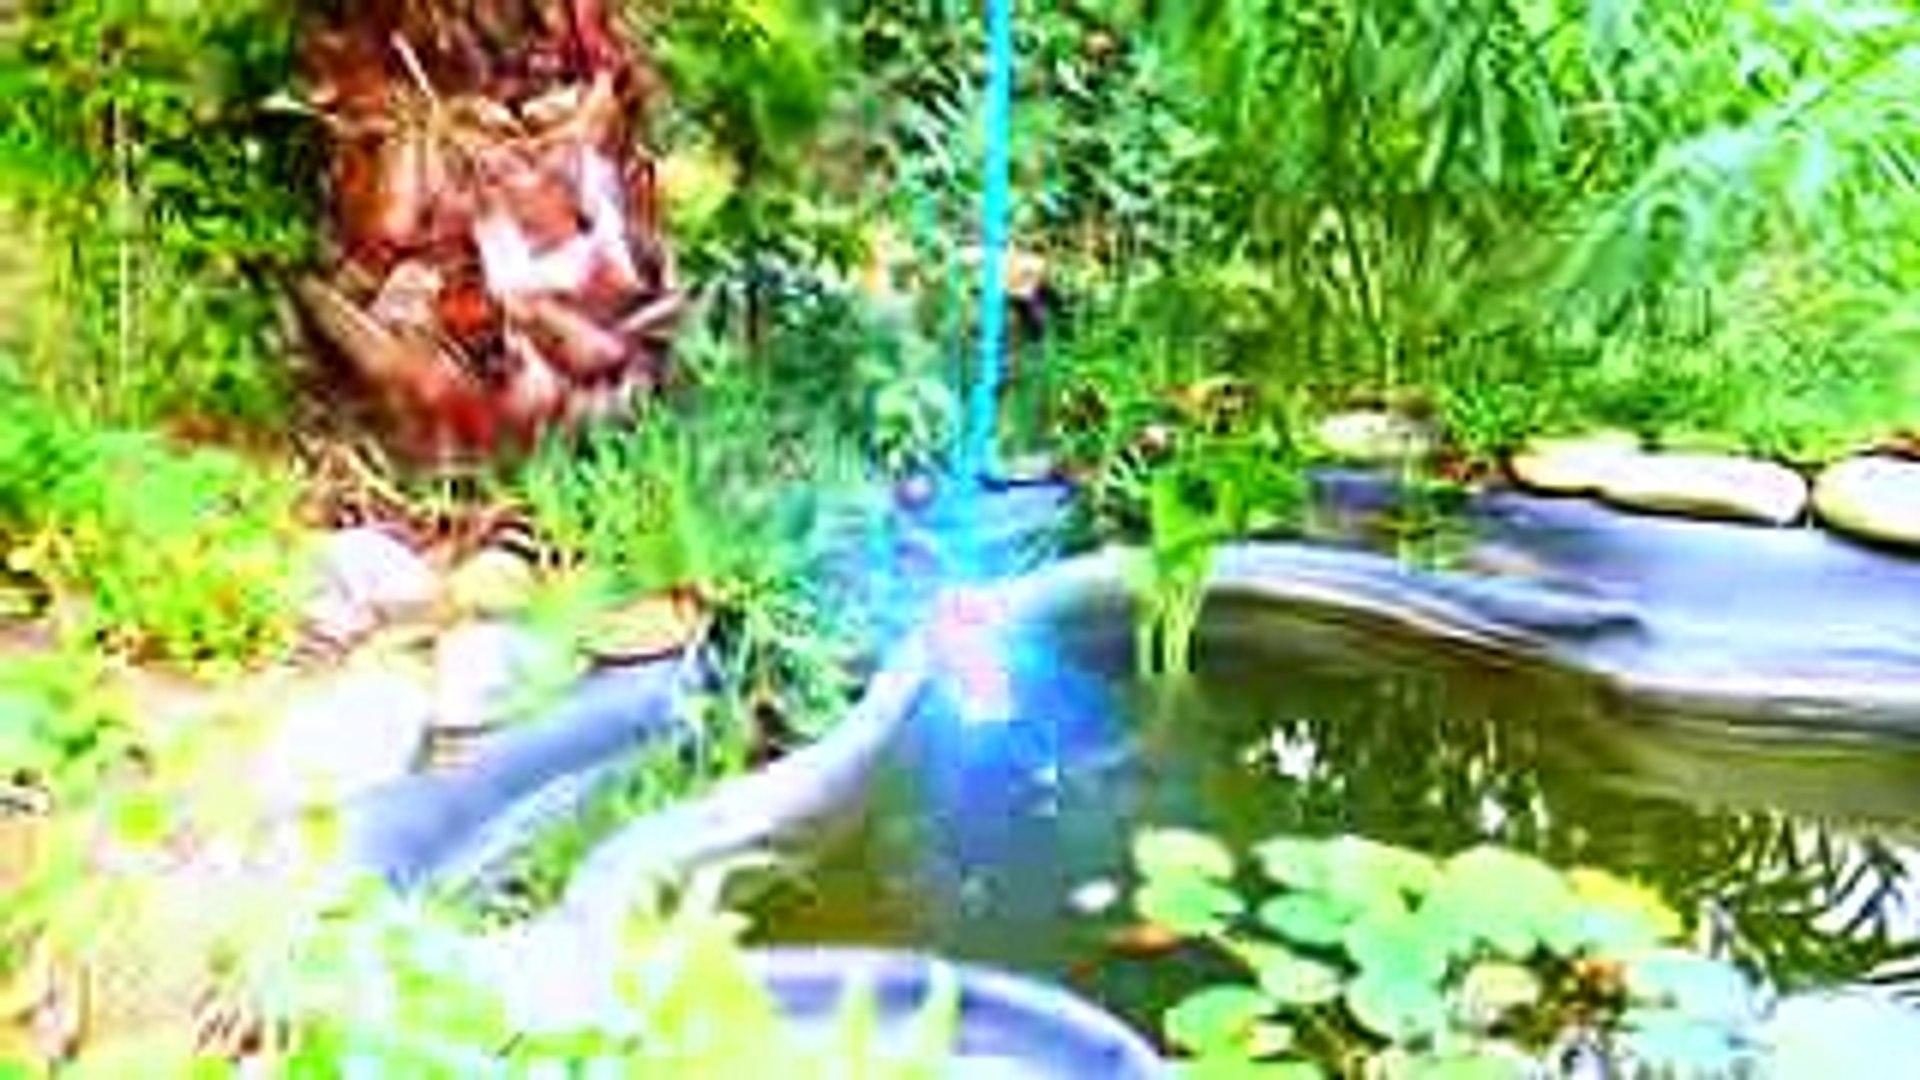 Настя и золотая рыбка  Nastya pretend play with magic gold fish